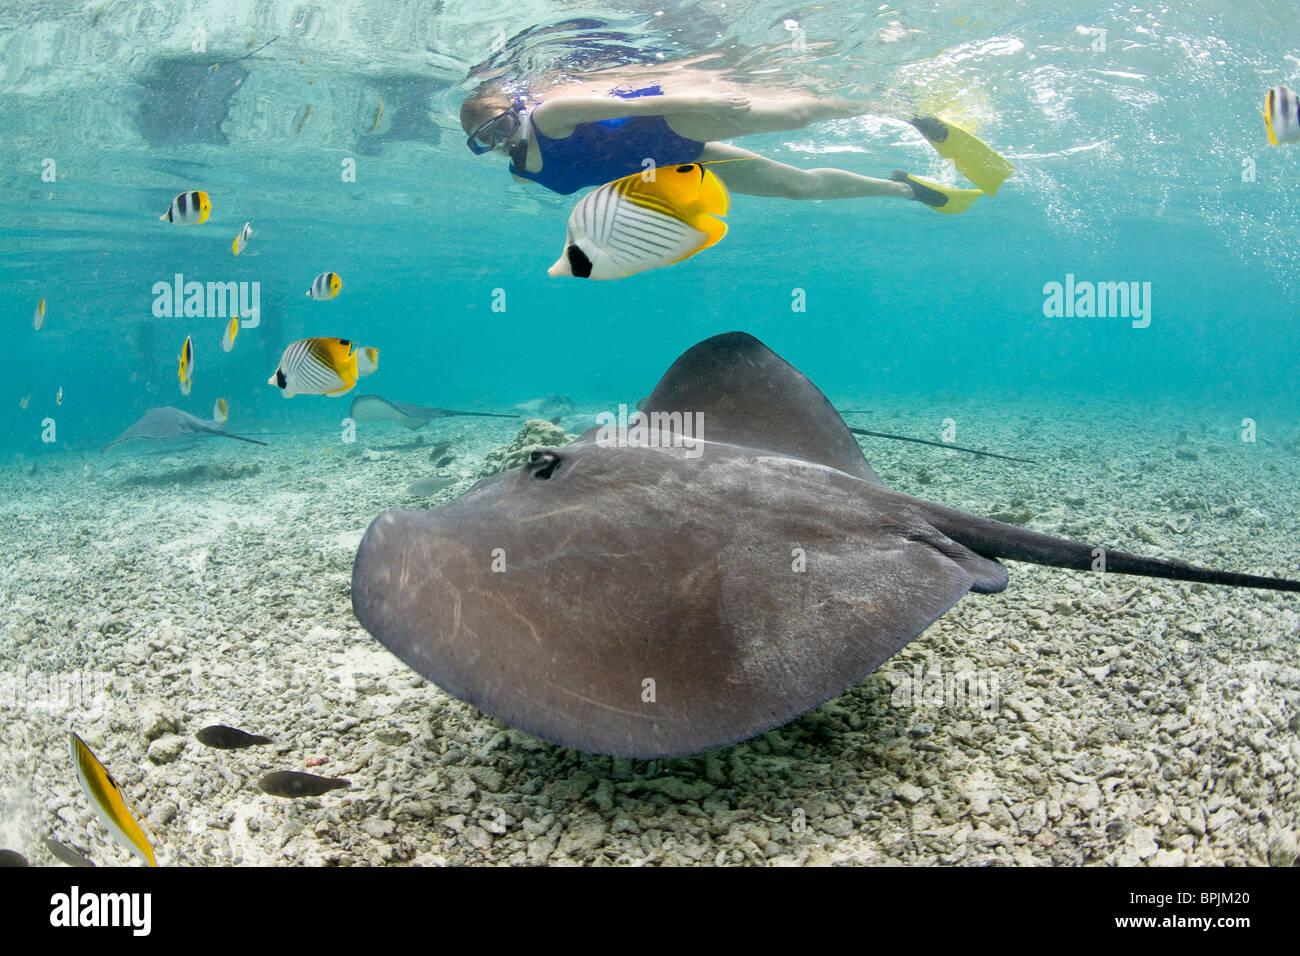 Lagoon safari trip to snorkel with marinelife - stingrays , - Stock Image